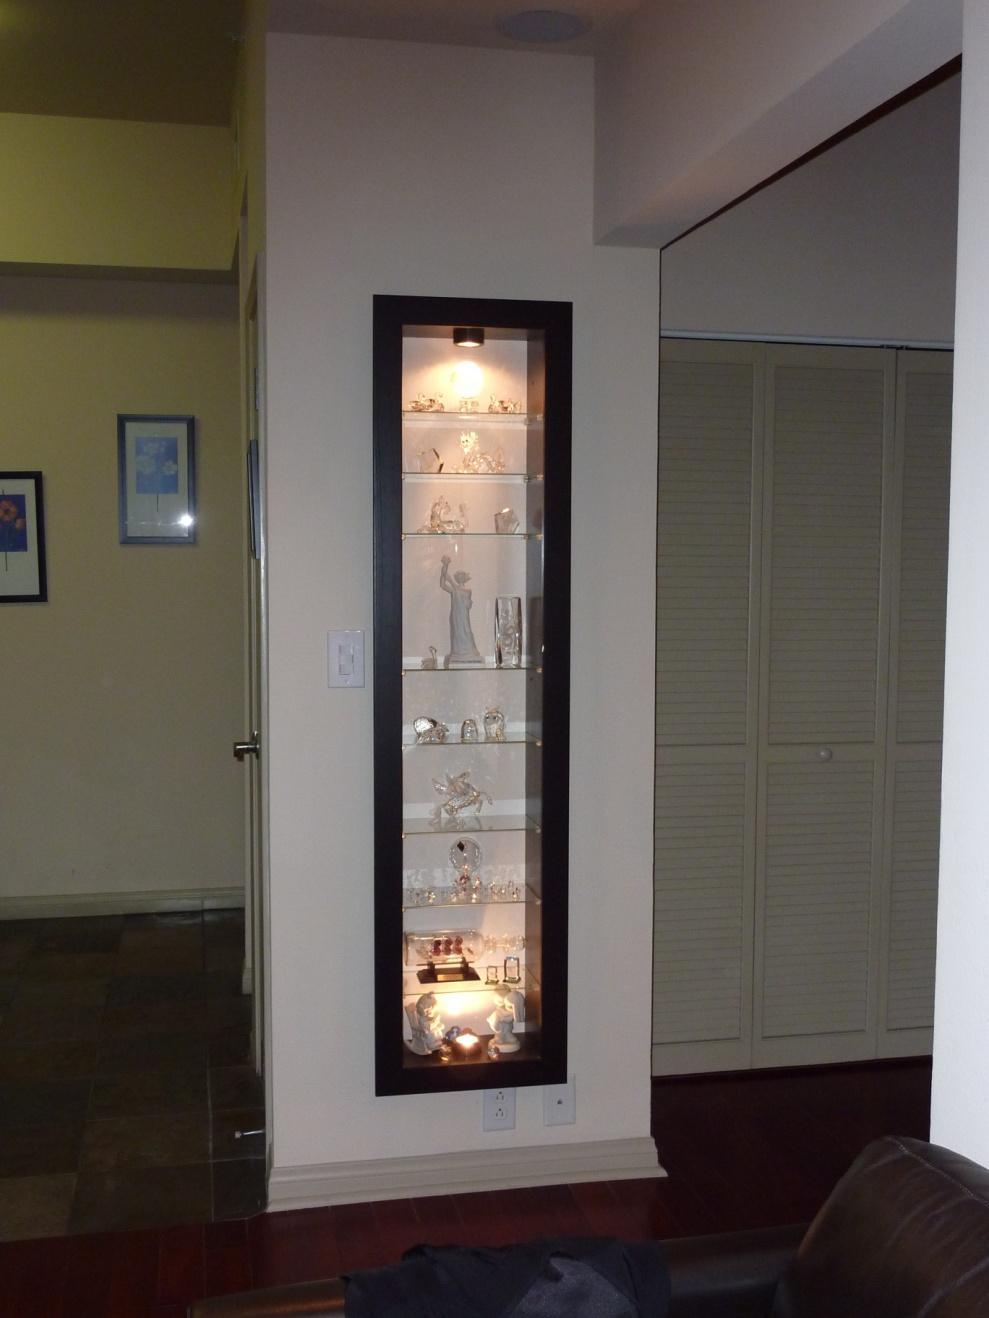 ikea wall mounted lights photo - 7